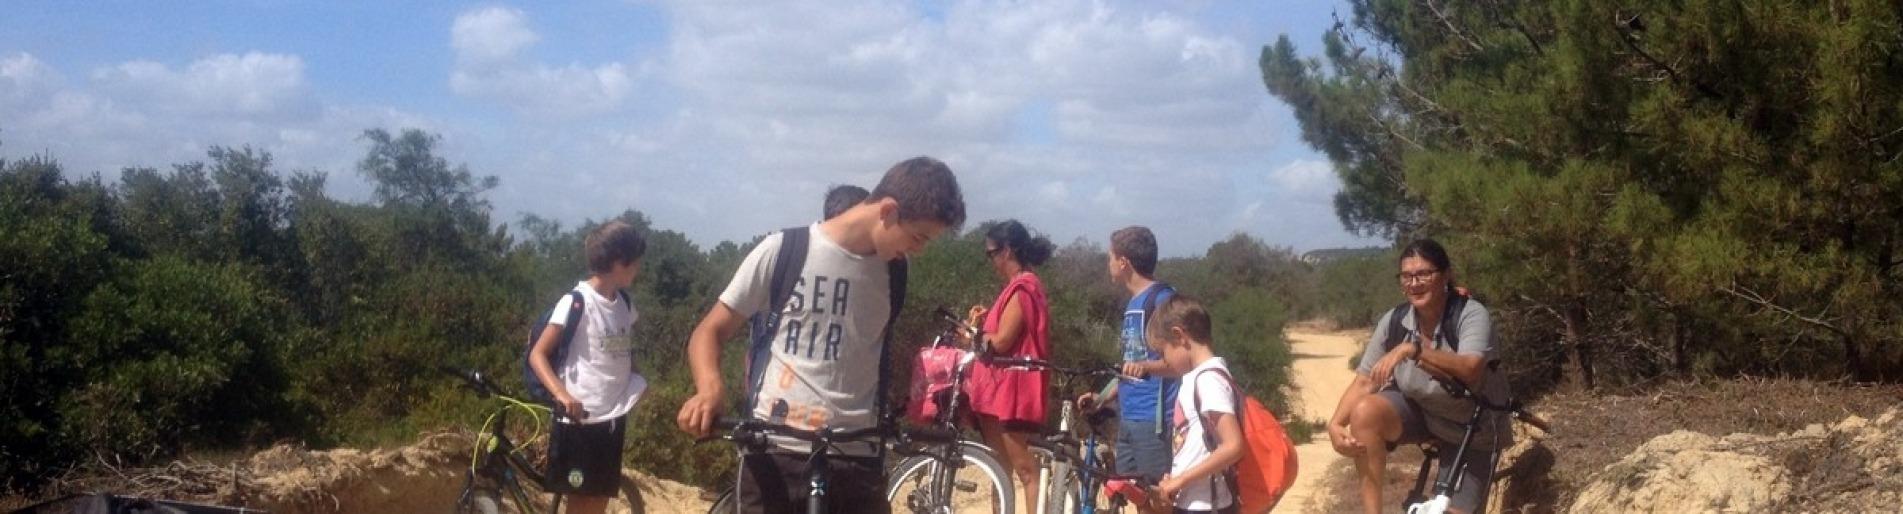 7 - lisbon-belem-caparica-beach-bike-tour-4 copy